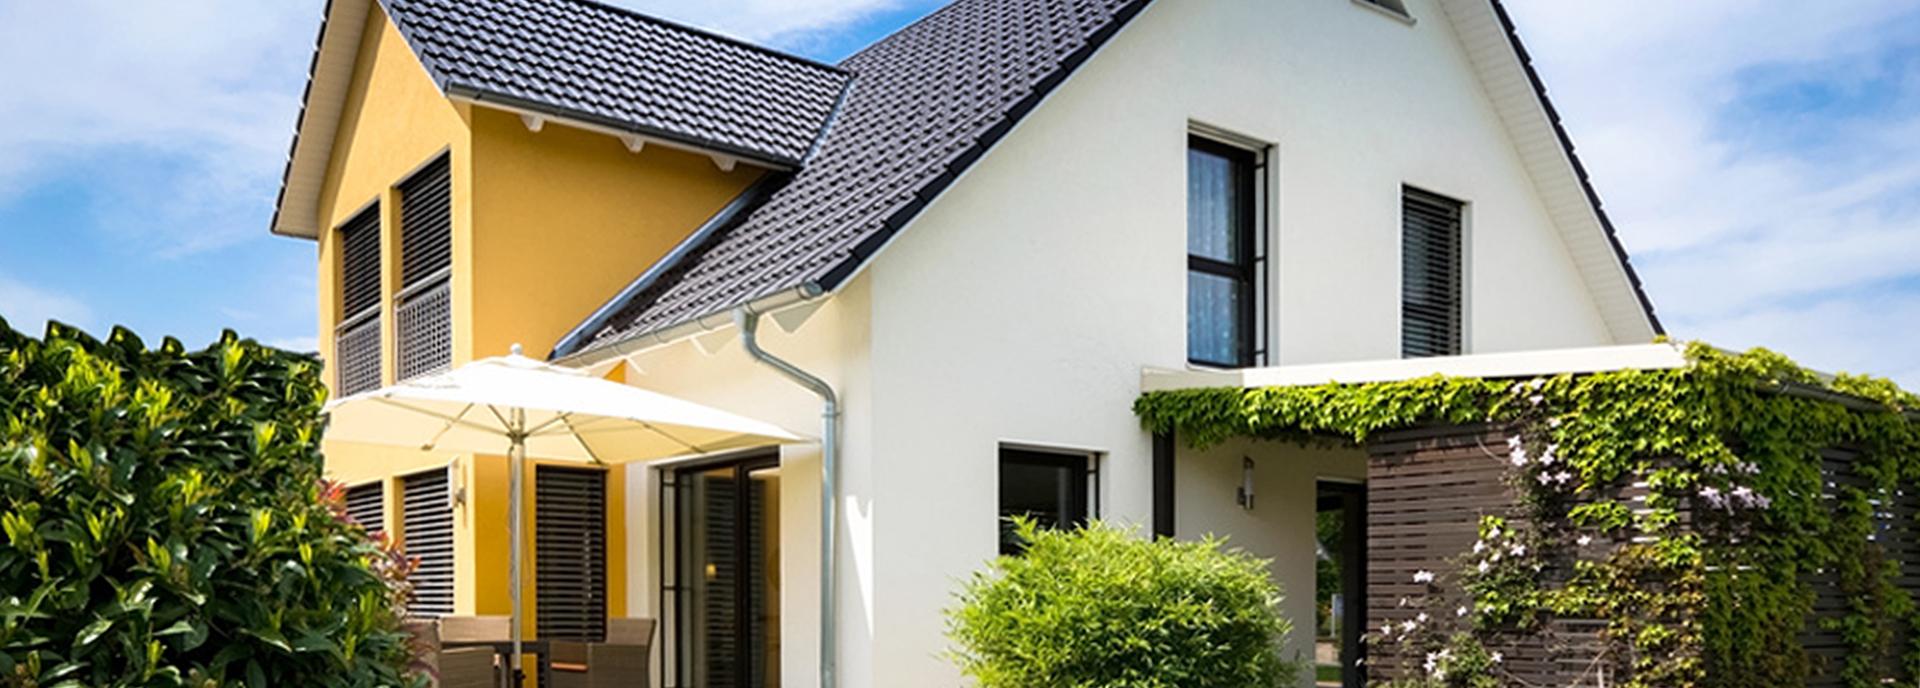 Immobilien verkaufen in Köln